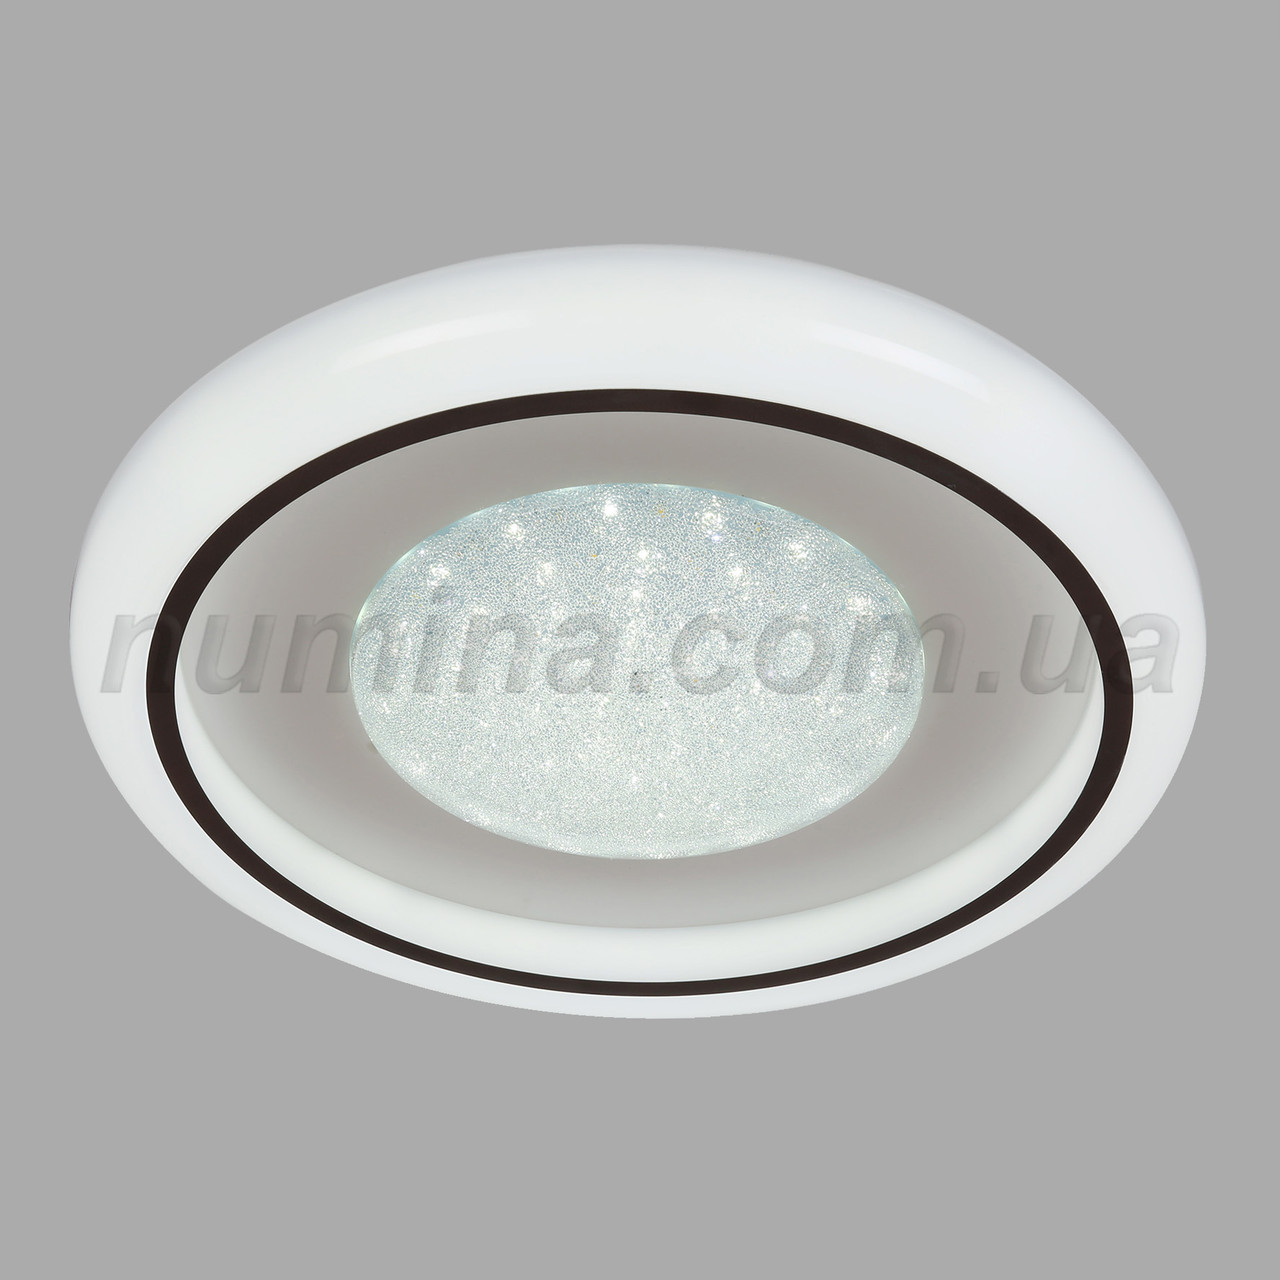 Люстра потолочная LED 10-6725A D500(70W*2)WT